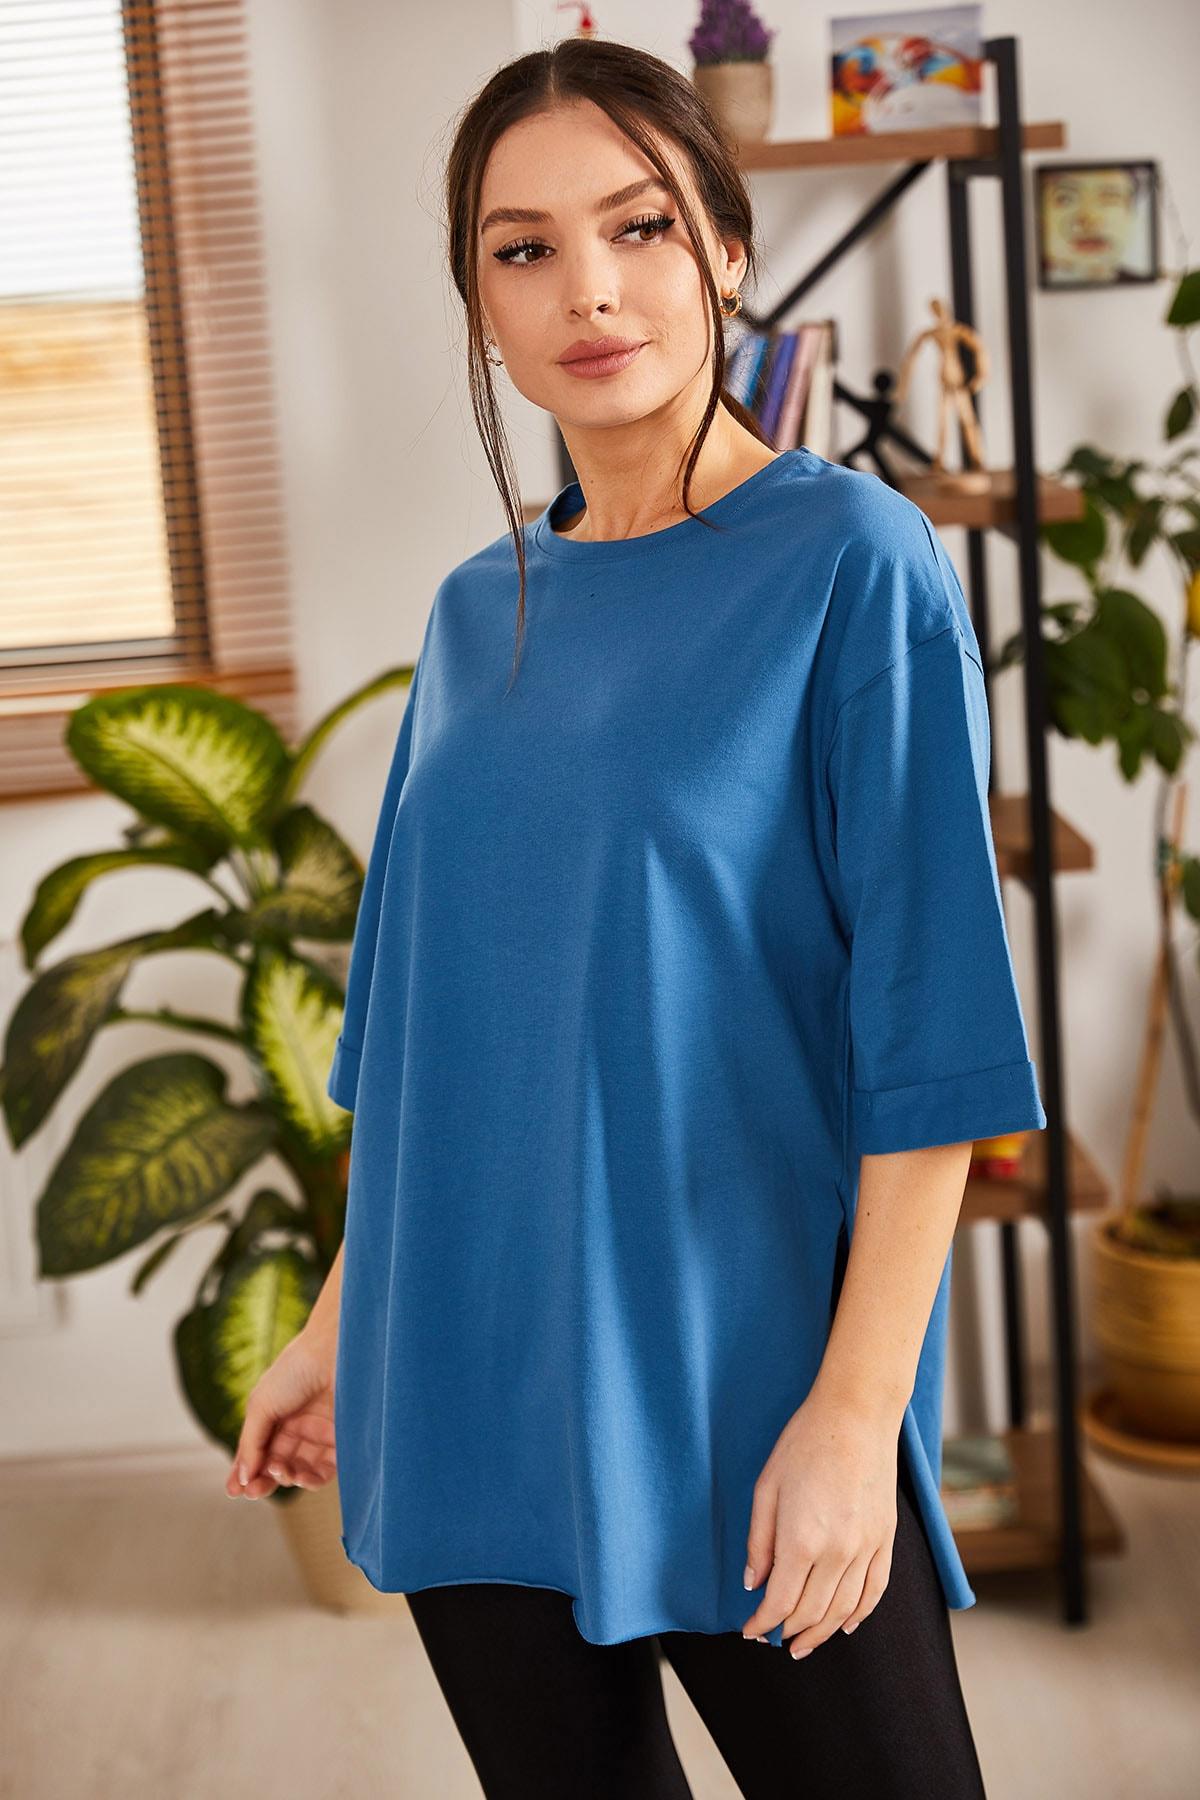 armonika Kadın Mavi Yuvarlak Yaka Geniş Kollu Yanı Yırtmaçlı T-Shirt ARM-19Y012003 1